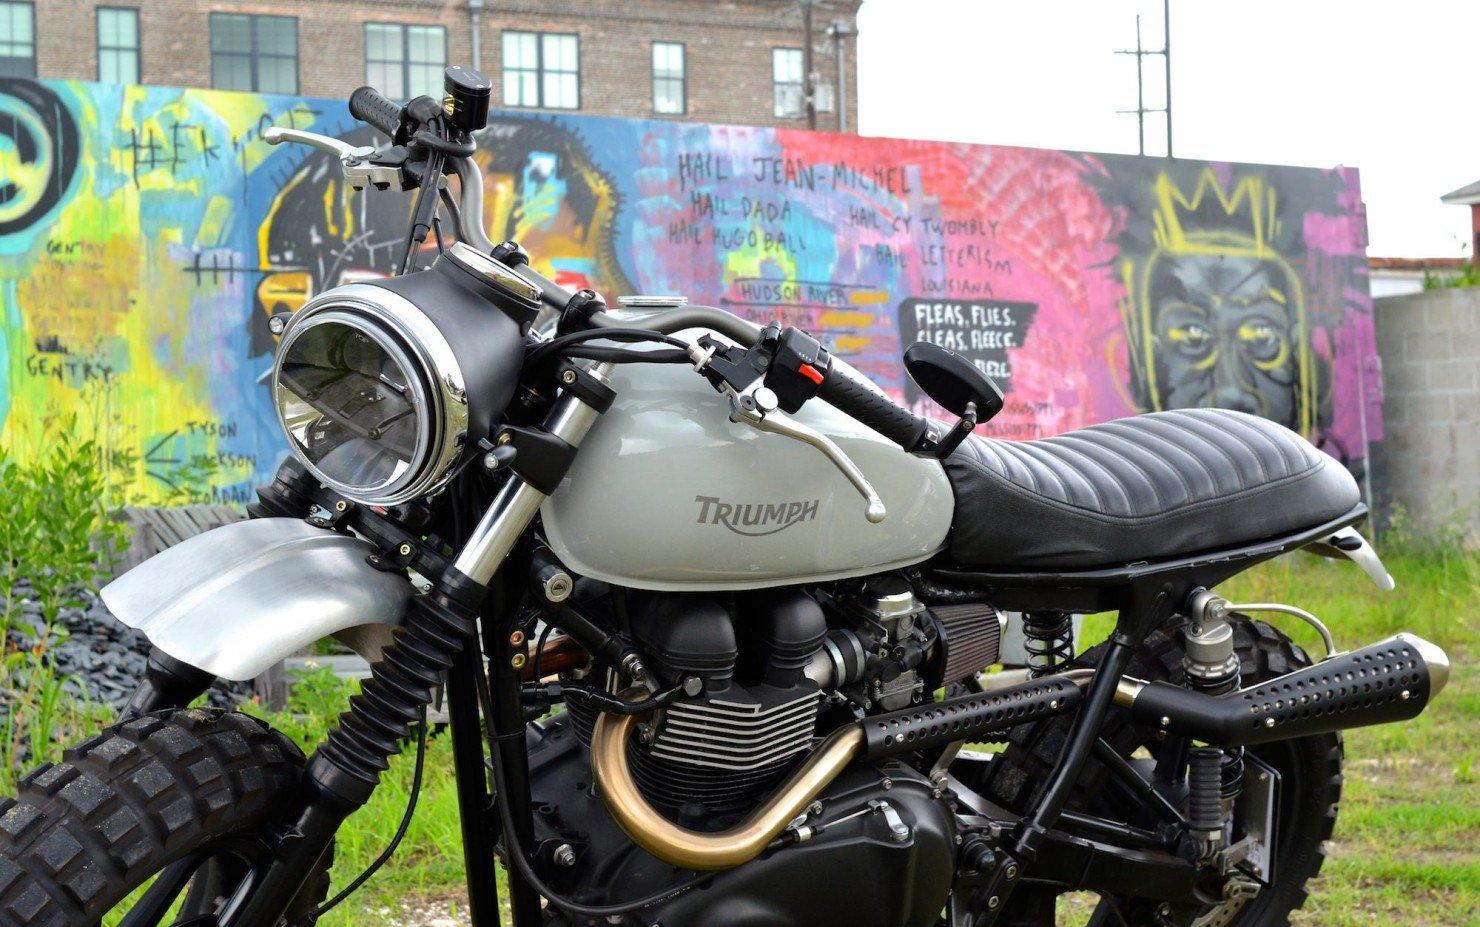 Triumph Scrambler Motorcycle 1